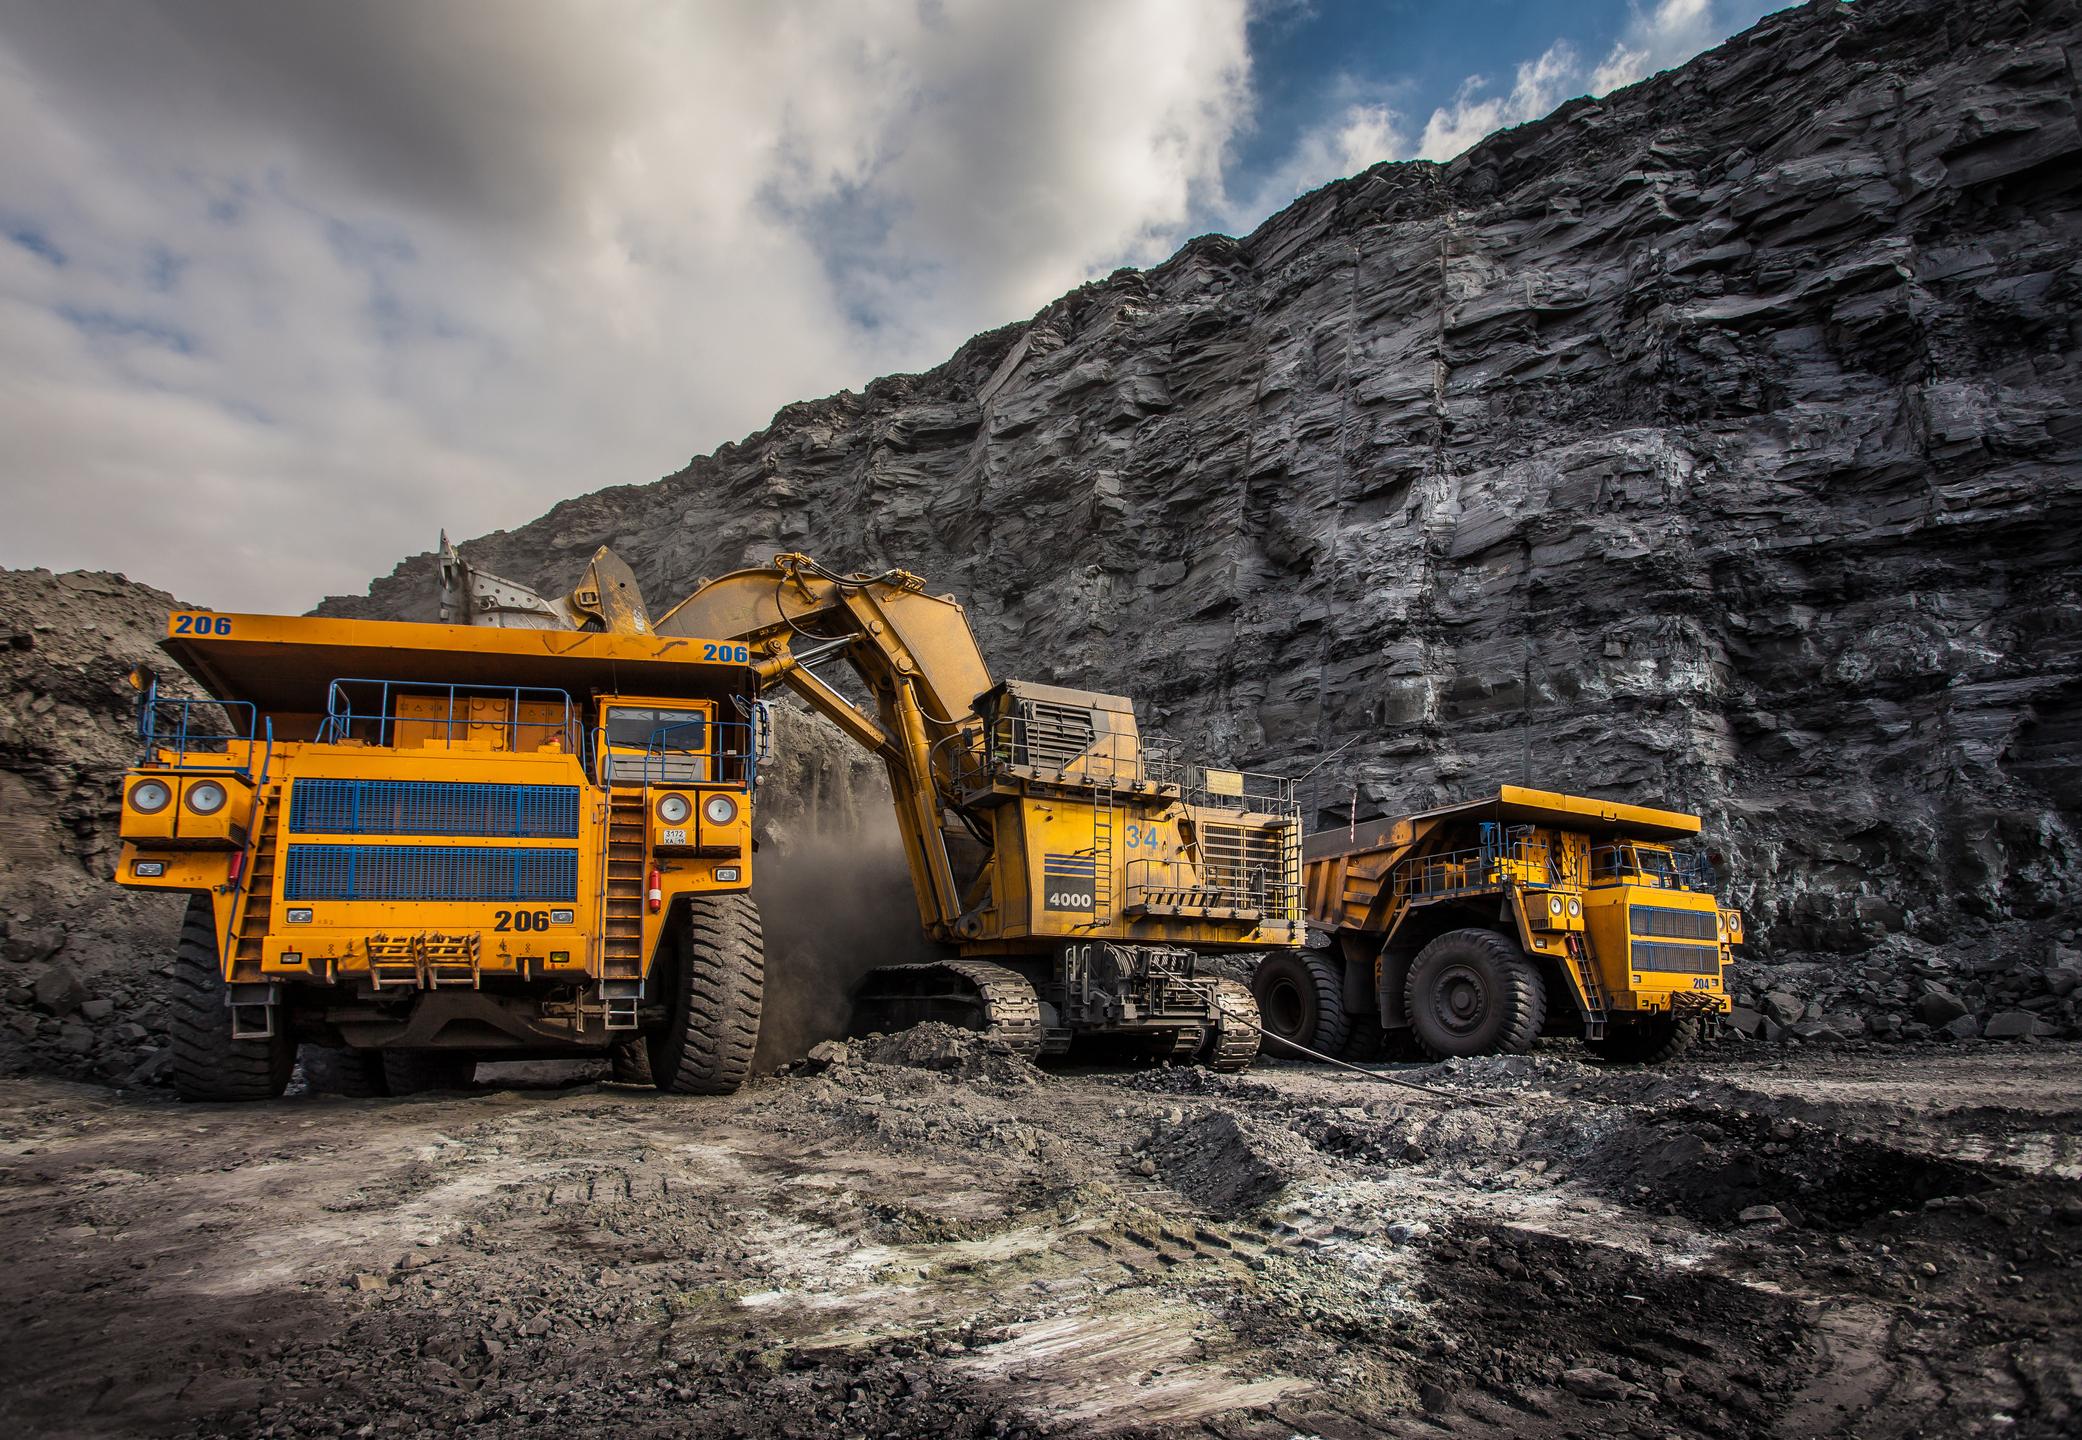 Loading trucks with coal.